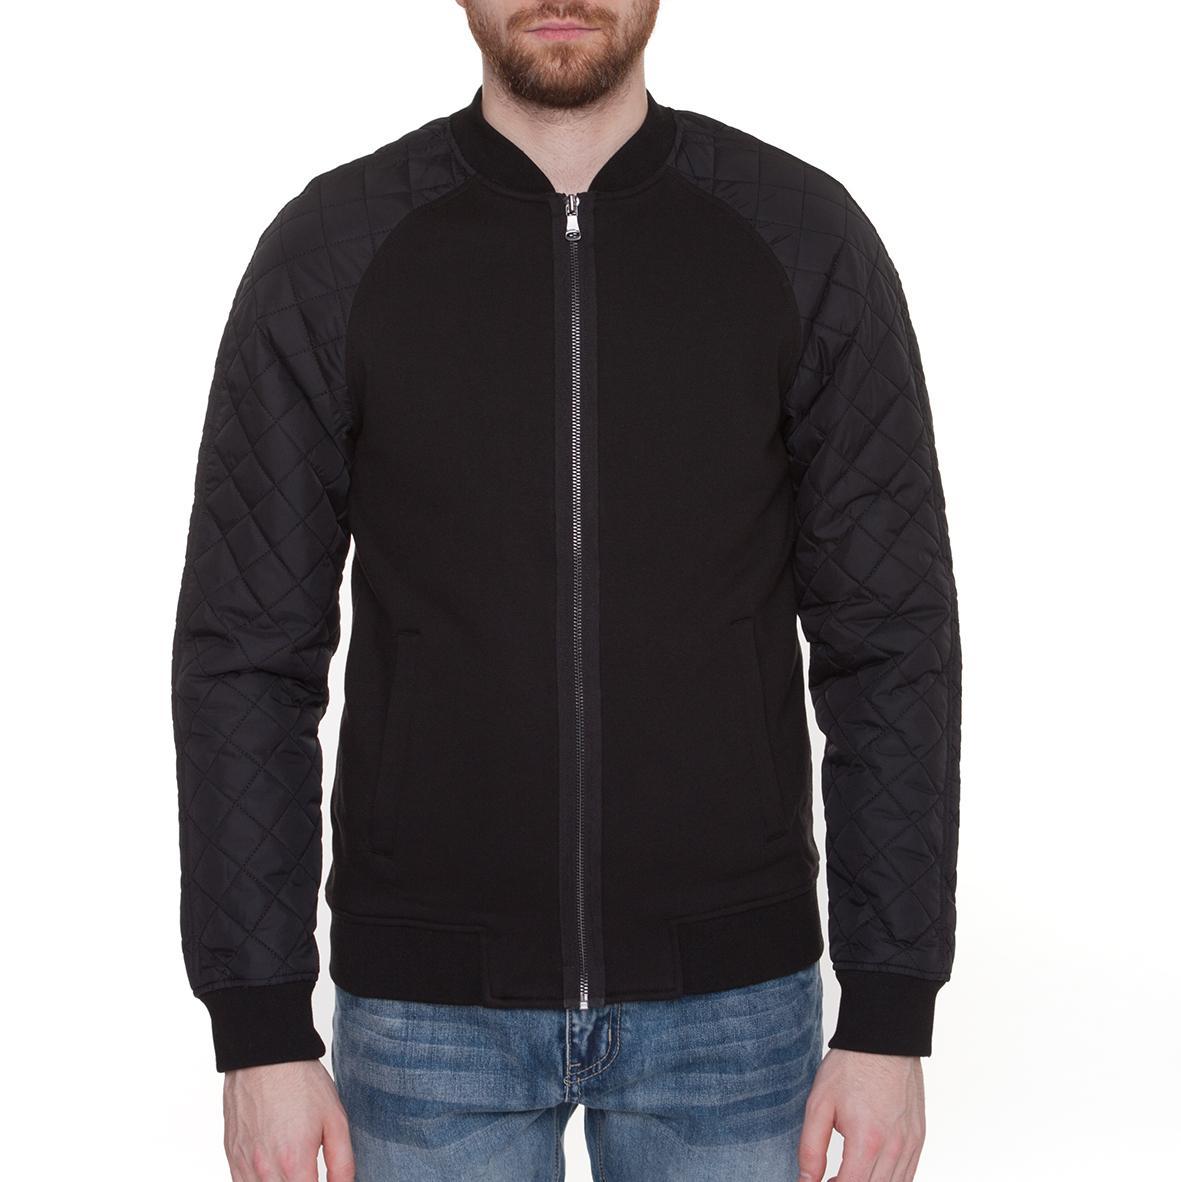 Куртка URBAN CLASSICS Diamond Nylon Sweatjacket (Черный)